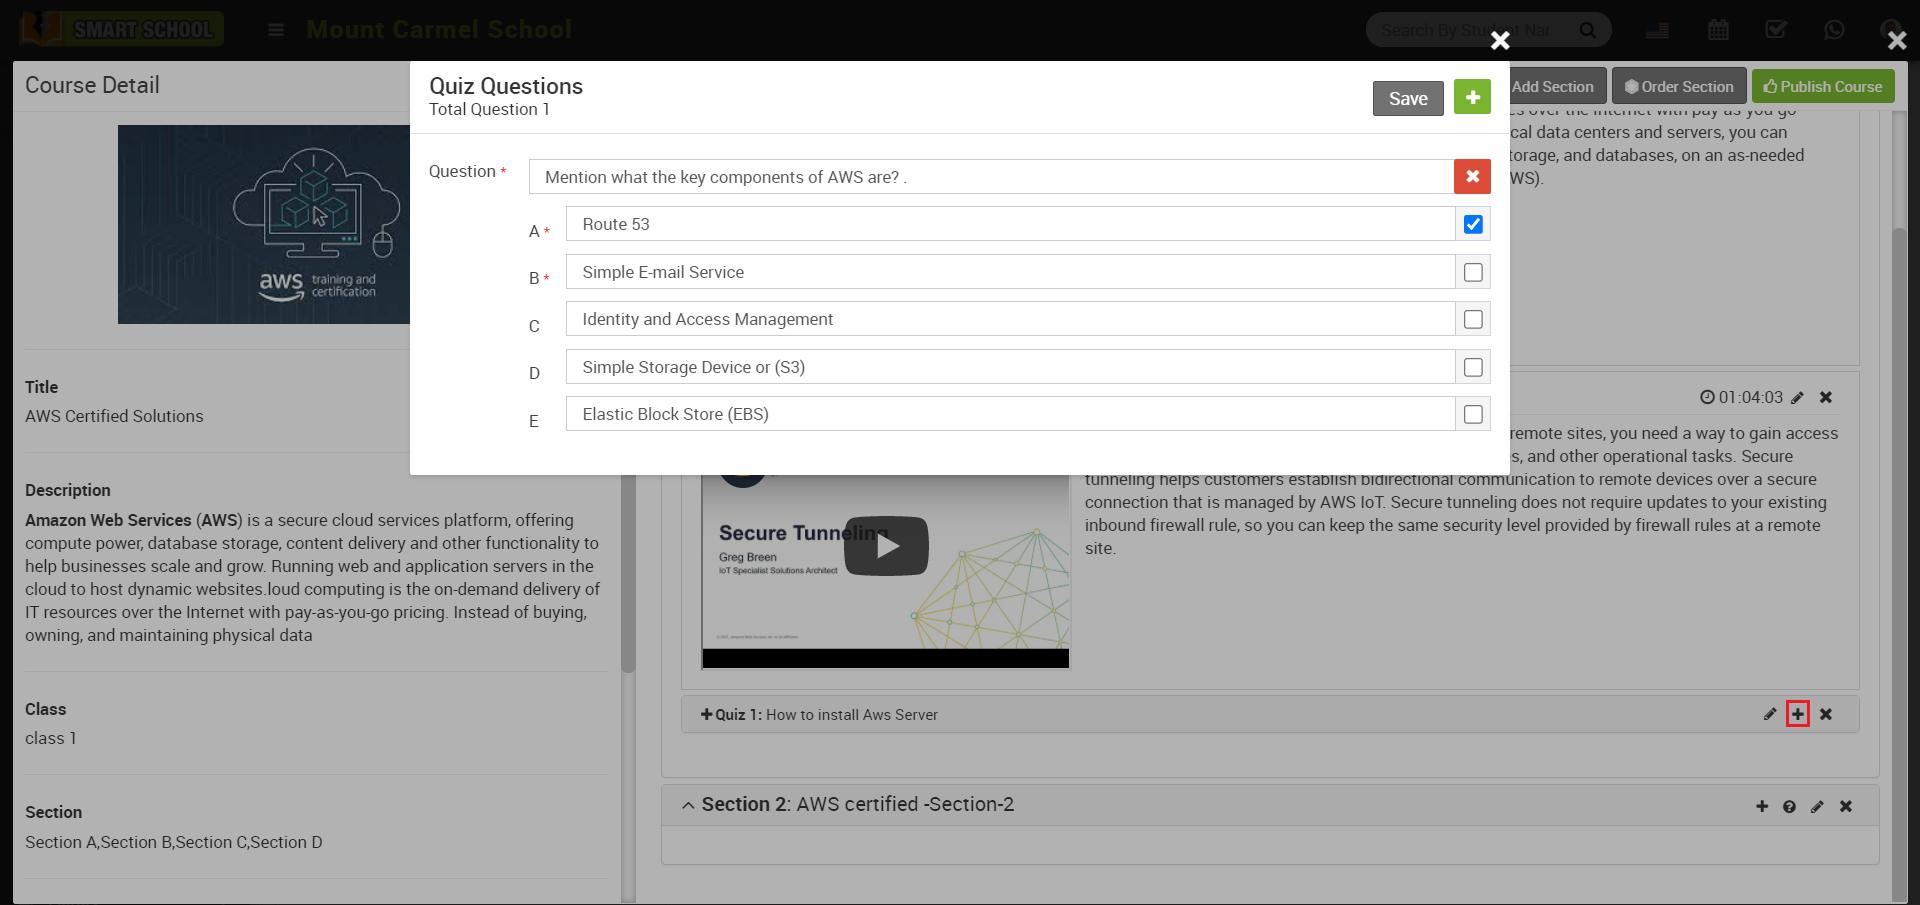 online course add quiz question image